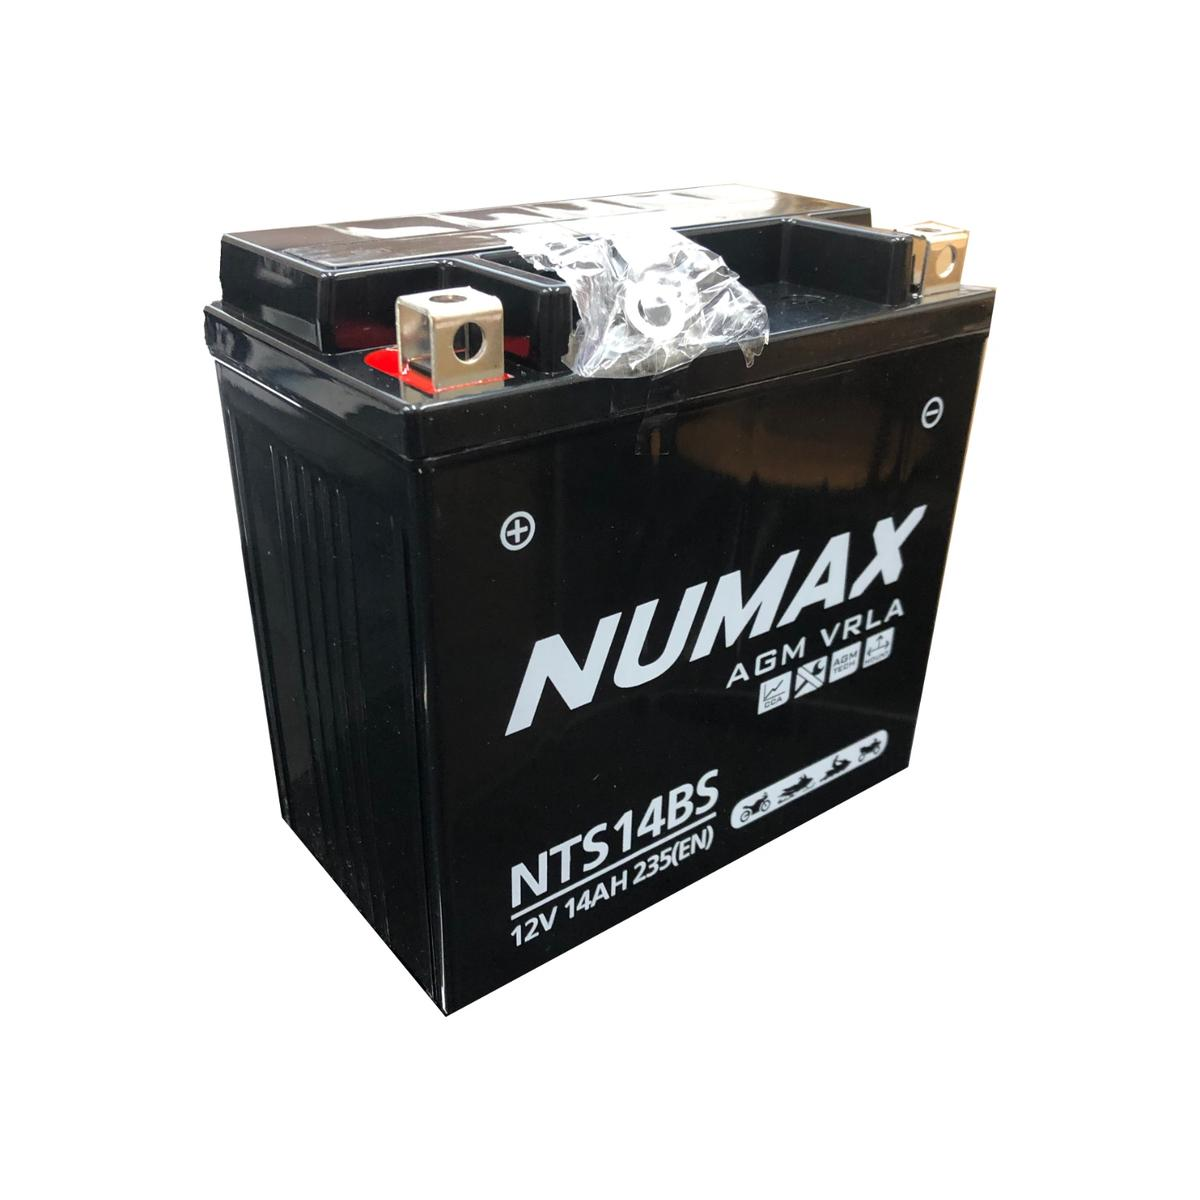 Numax NTS14BS 12v Motorbike Bike Battery SUZUKI 650cc AN650 YTX14-4